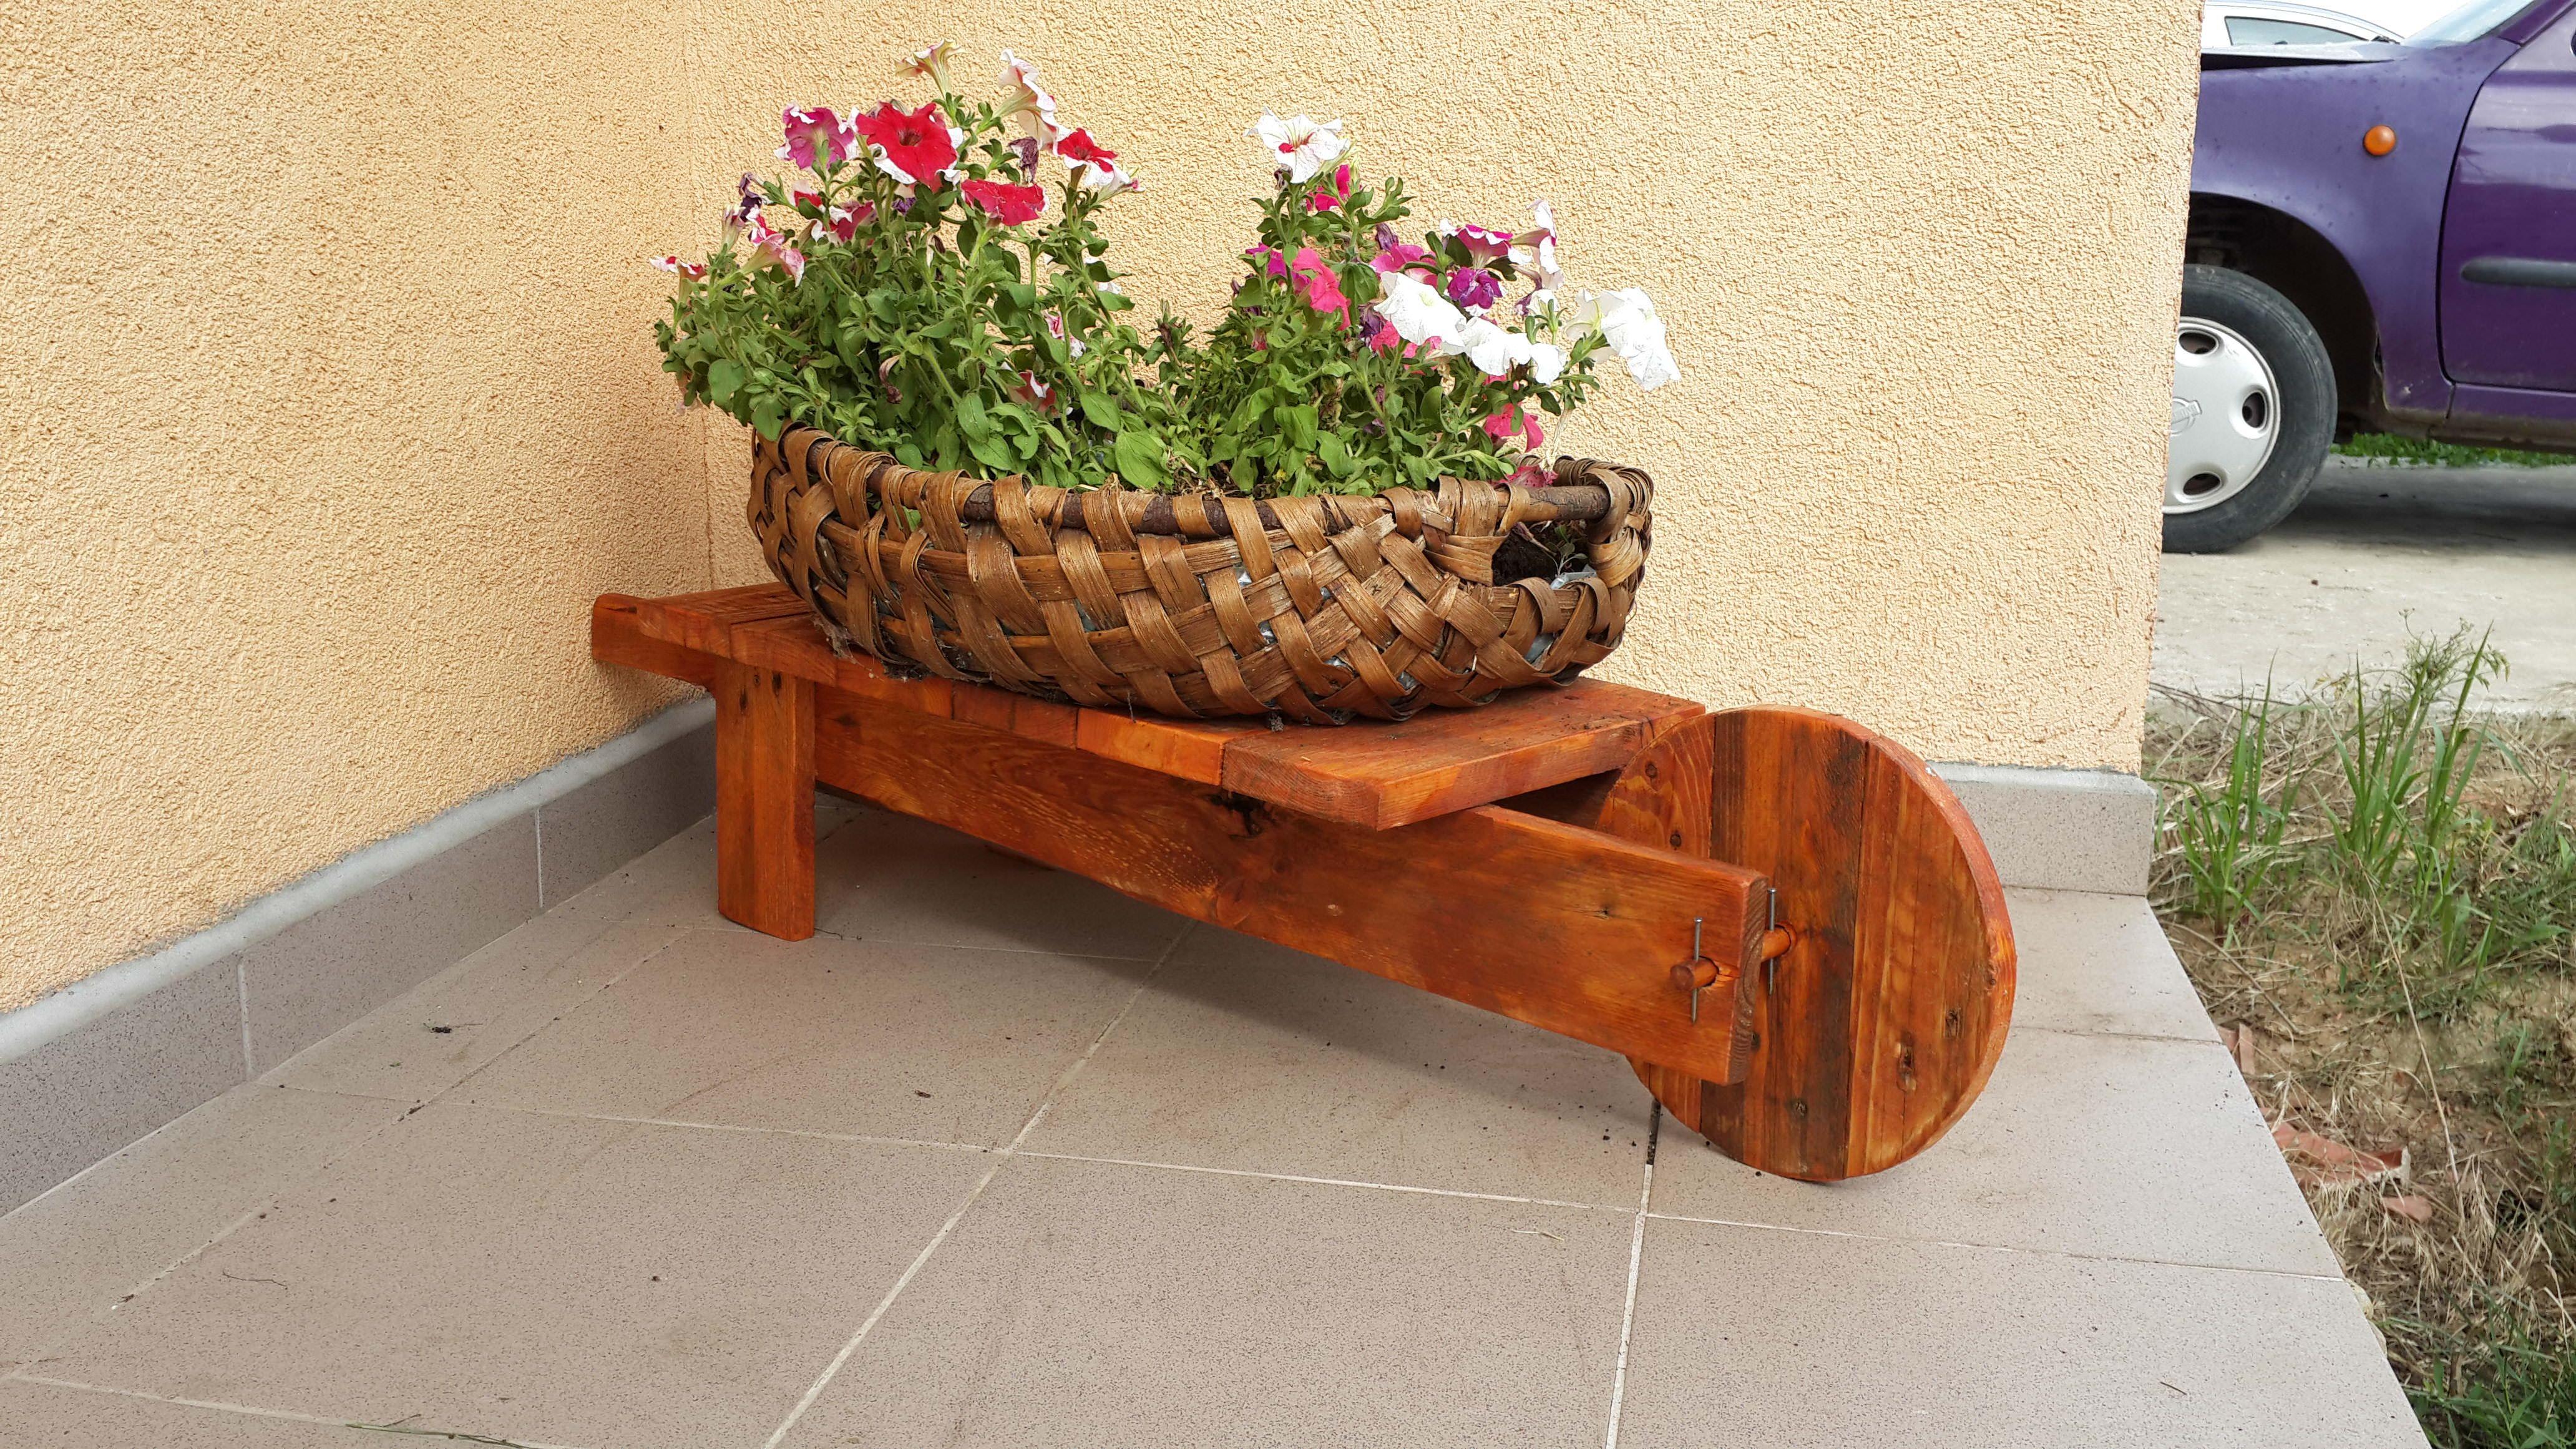 Mini Pallet Wheelbarrow Plant Stand | pallet ideas | Pinterest ...